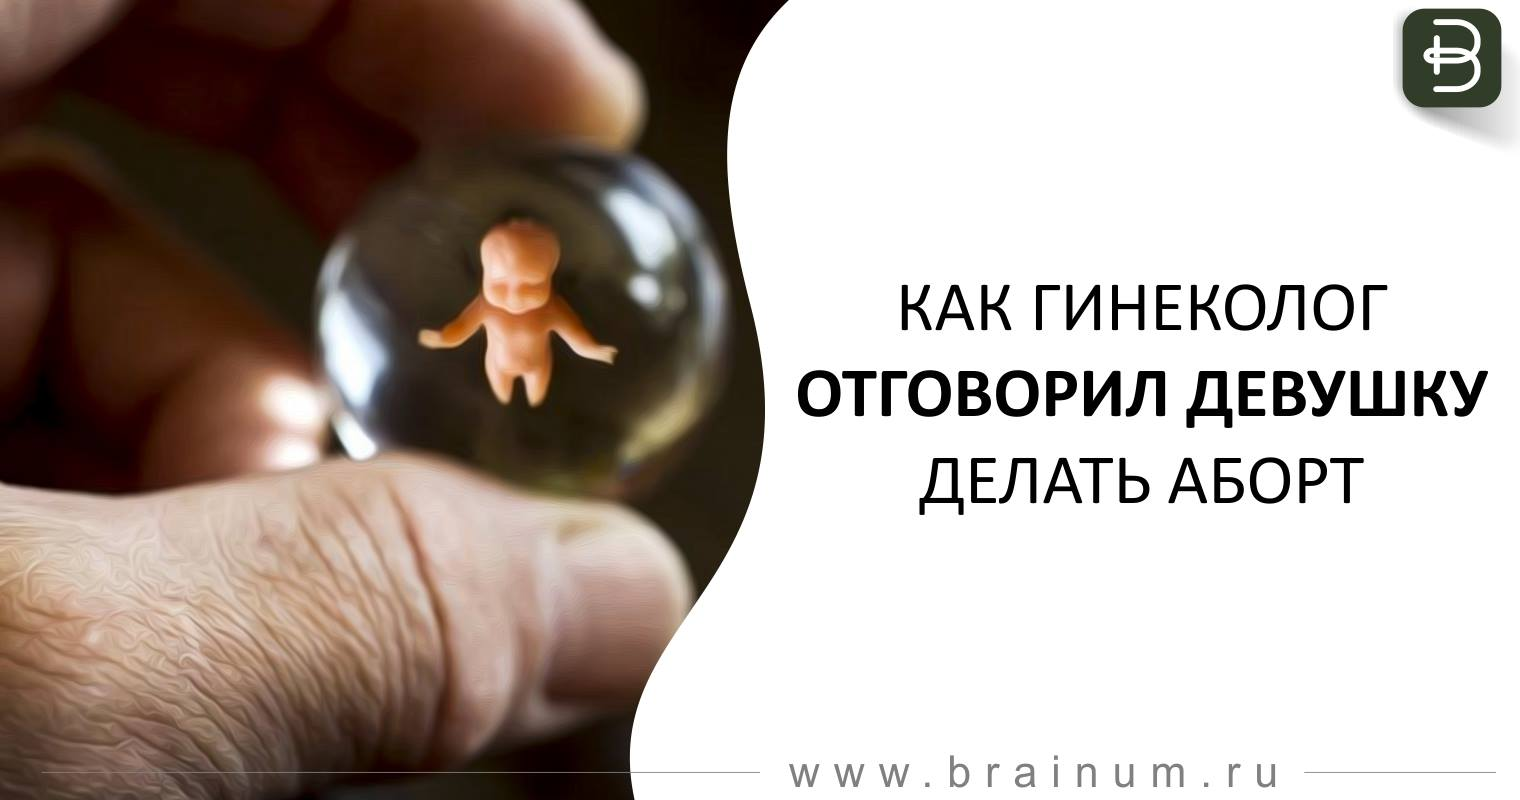 molodaya-krasivaya-devushka-prishla-k-vrachu-ginekologu